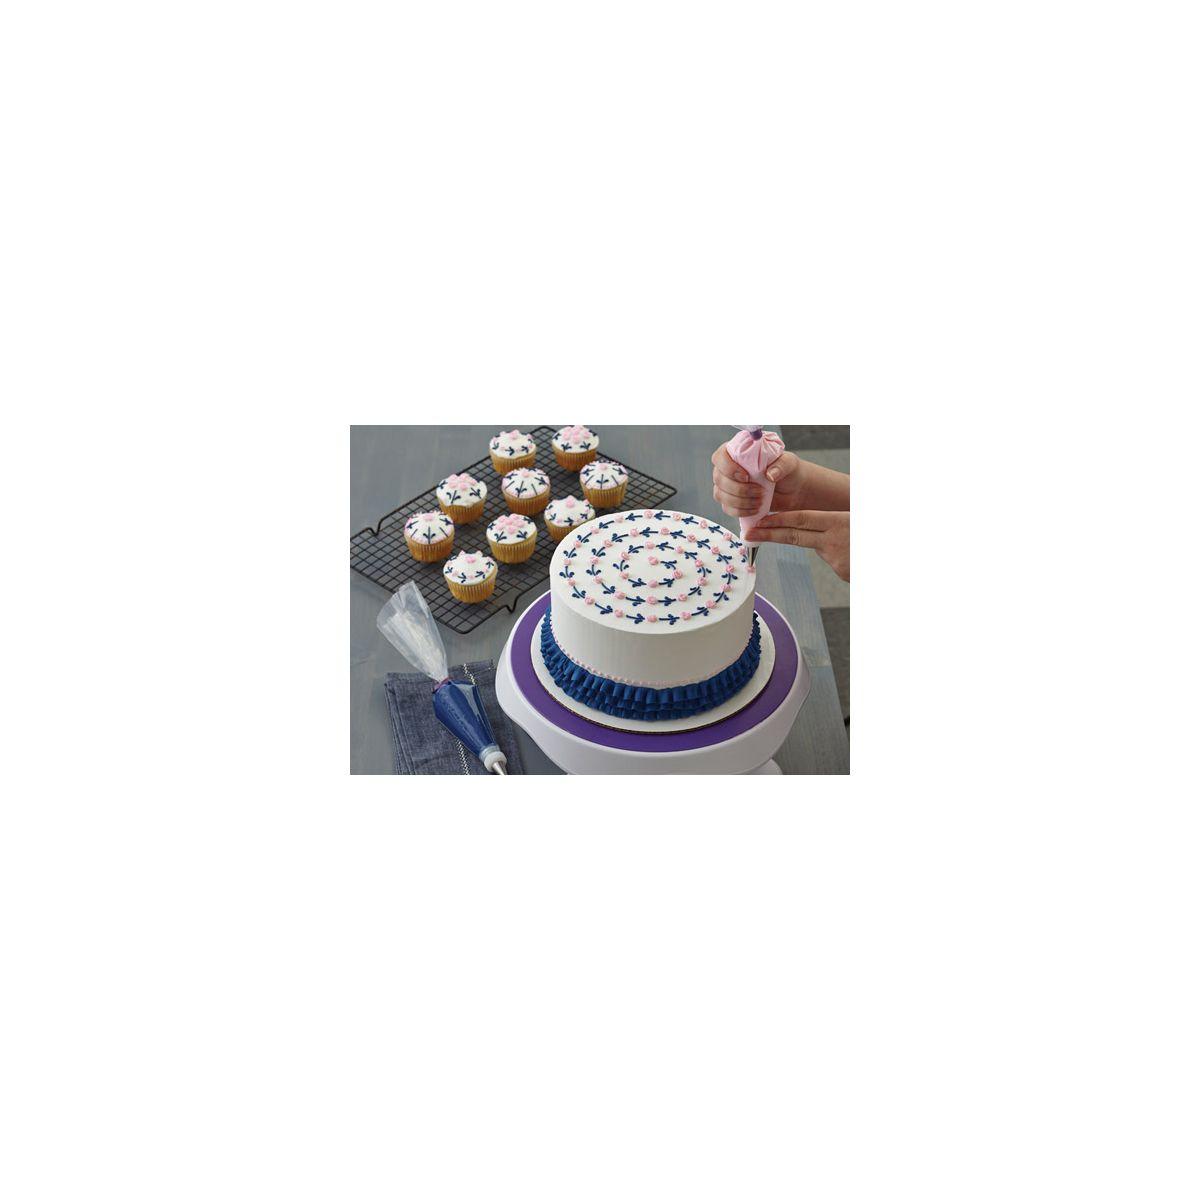 Strange Authorized Wilton Location Cakesupplies Wholesale Funny Birthday Cards Online Barepcheapnameinfo